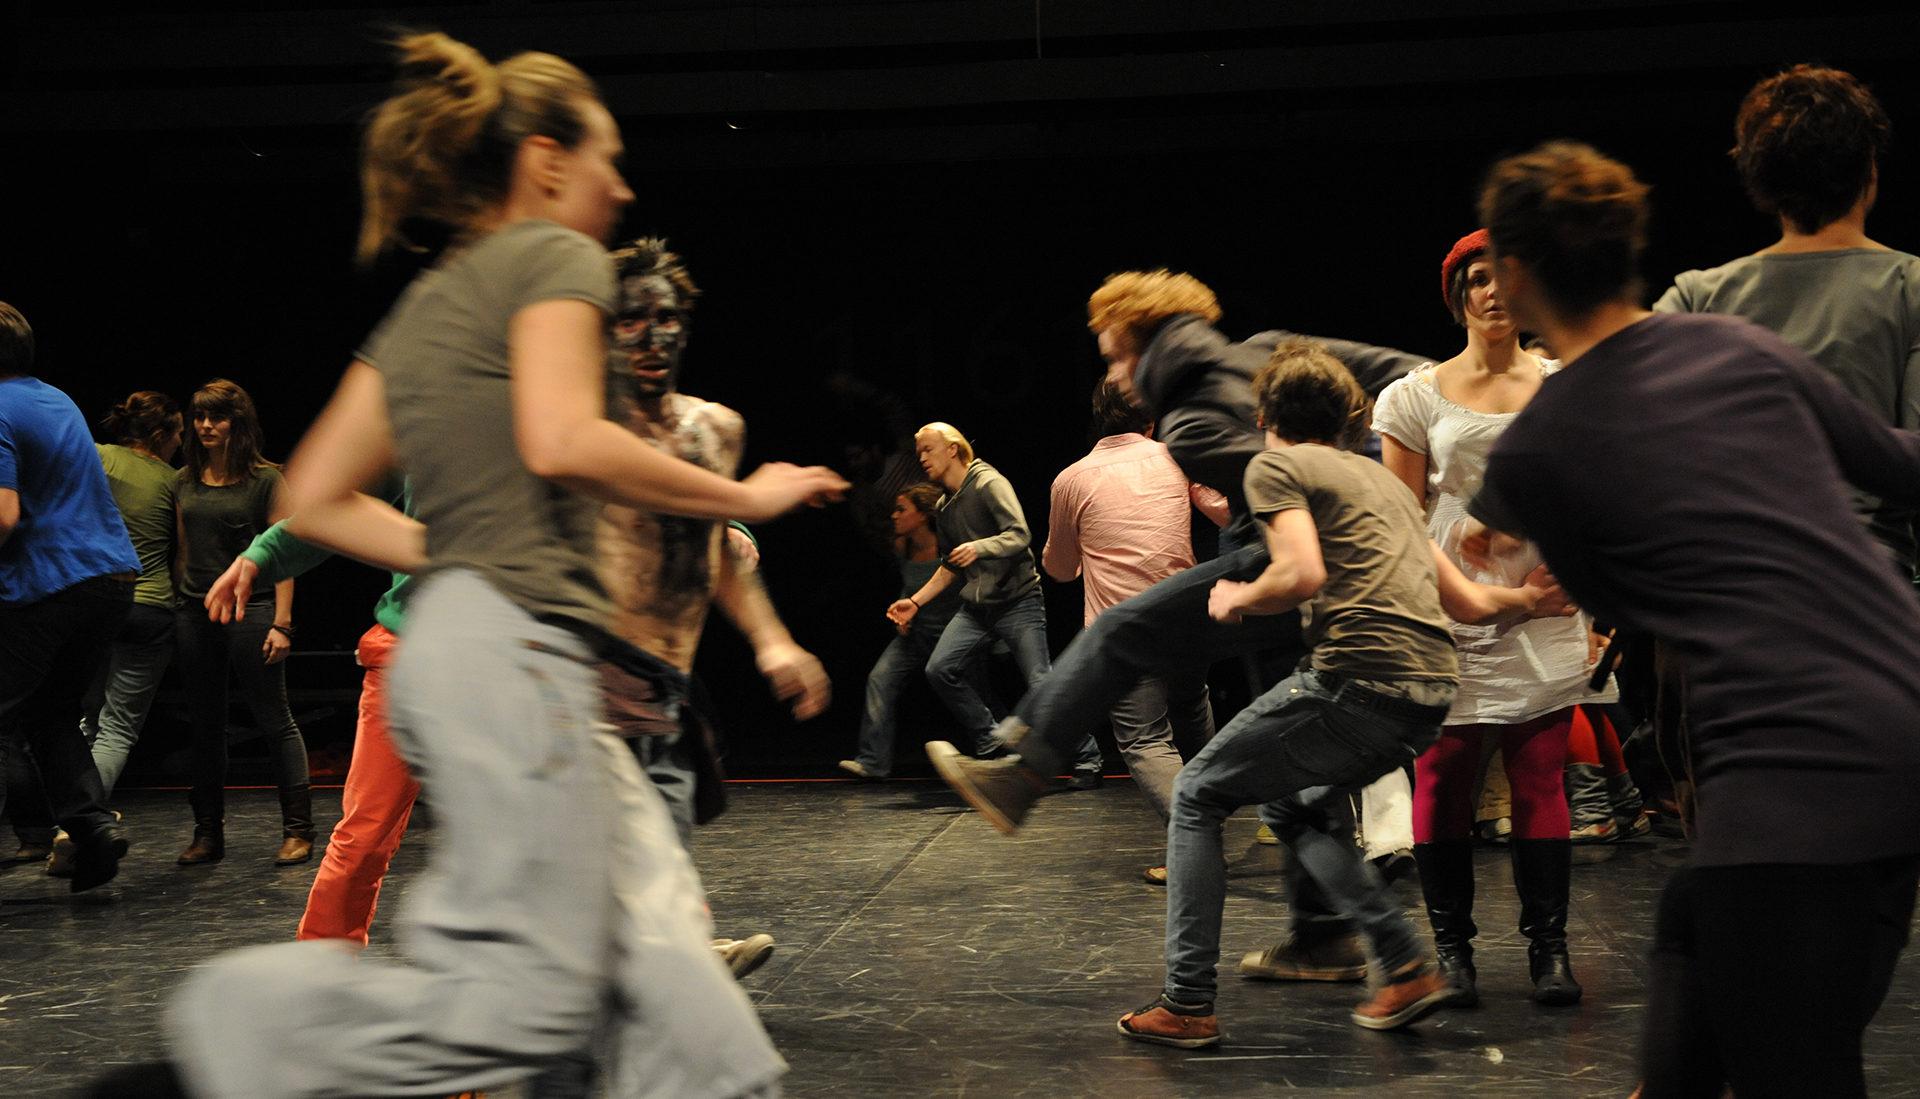 people running onstage